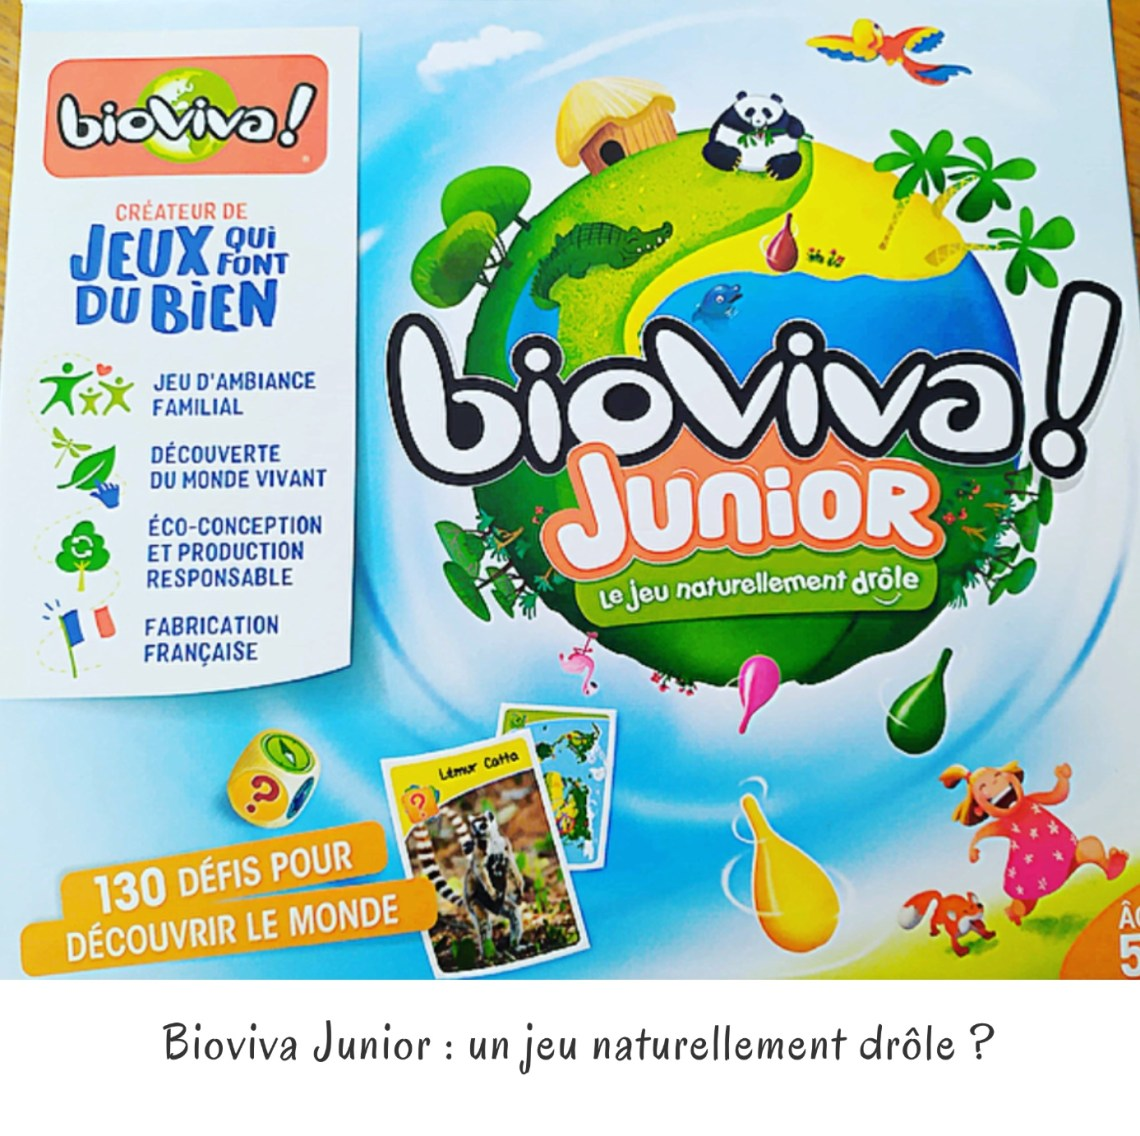 Bioviva Junior : un jeu naturellement drôle ?